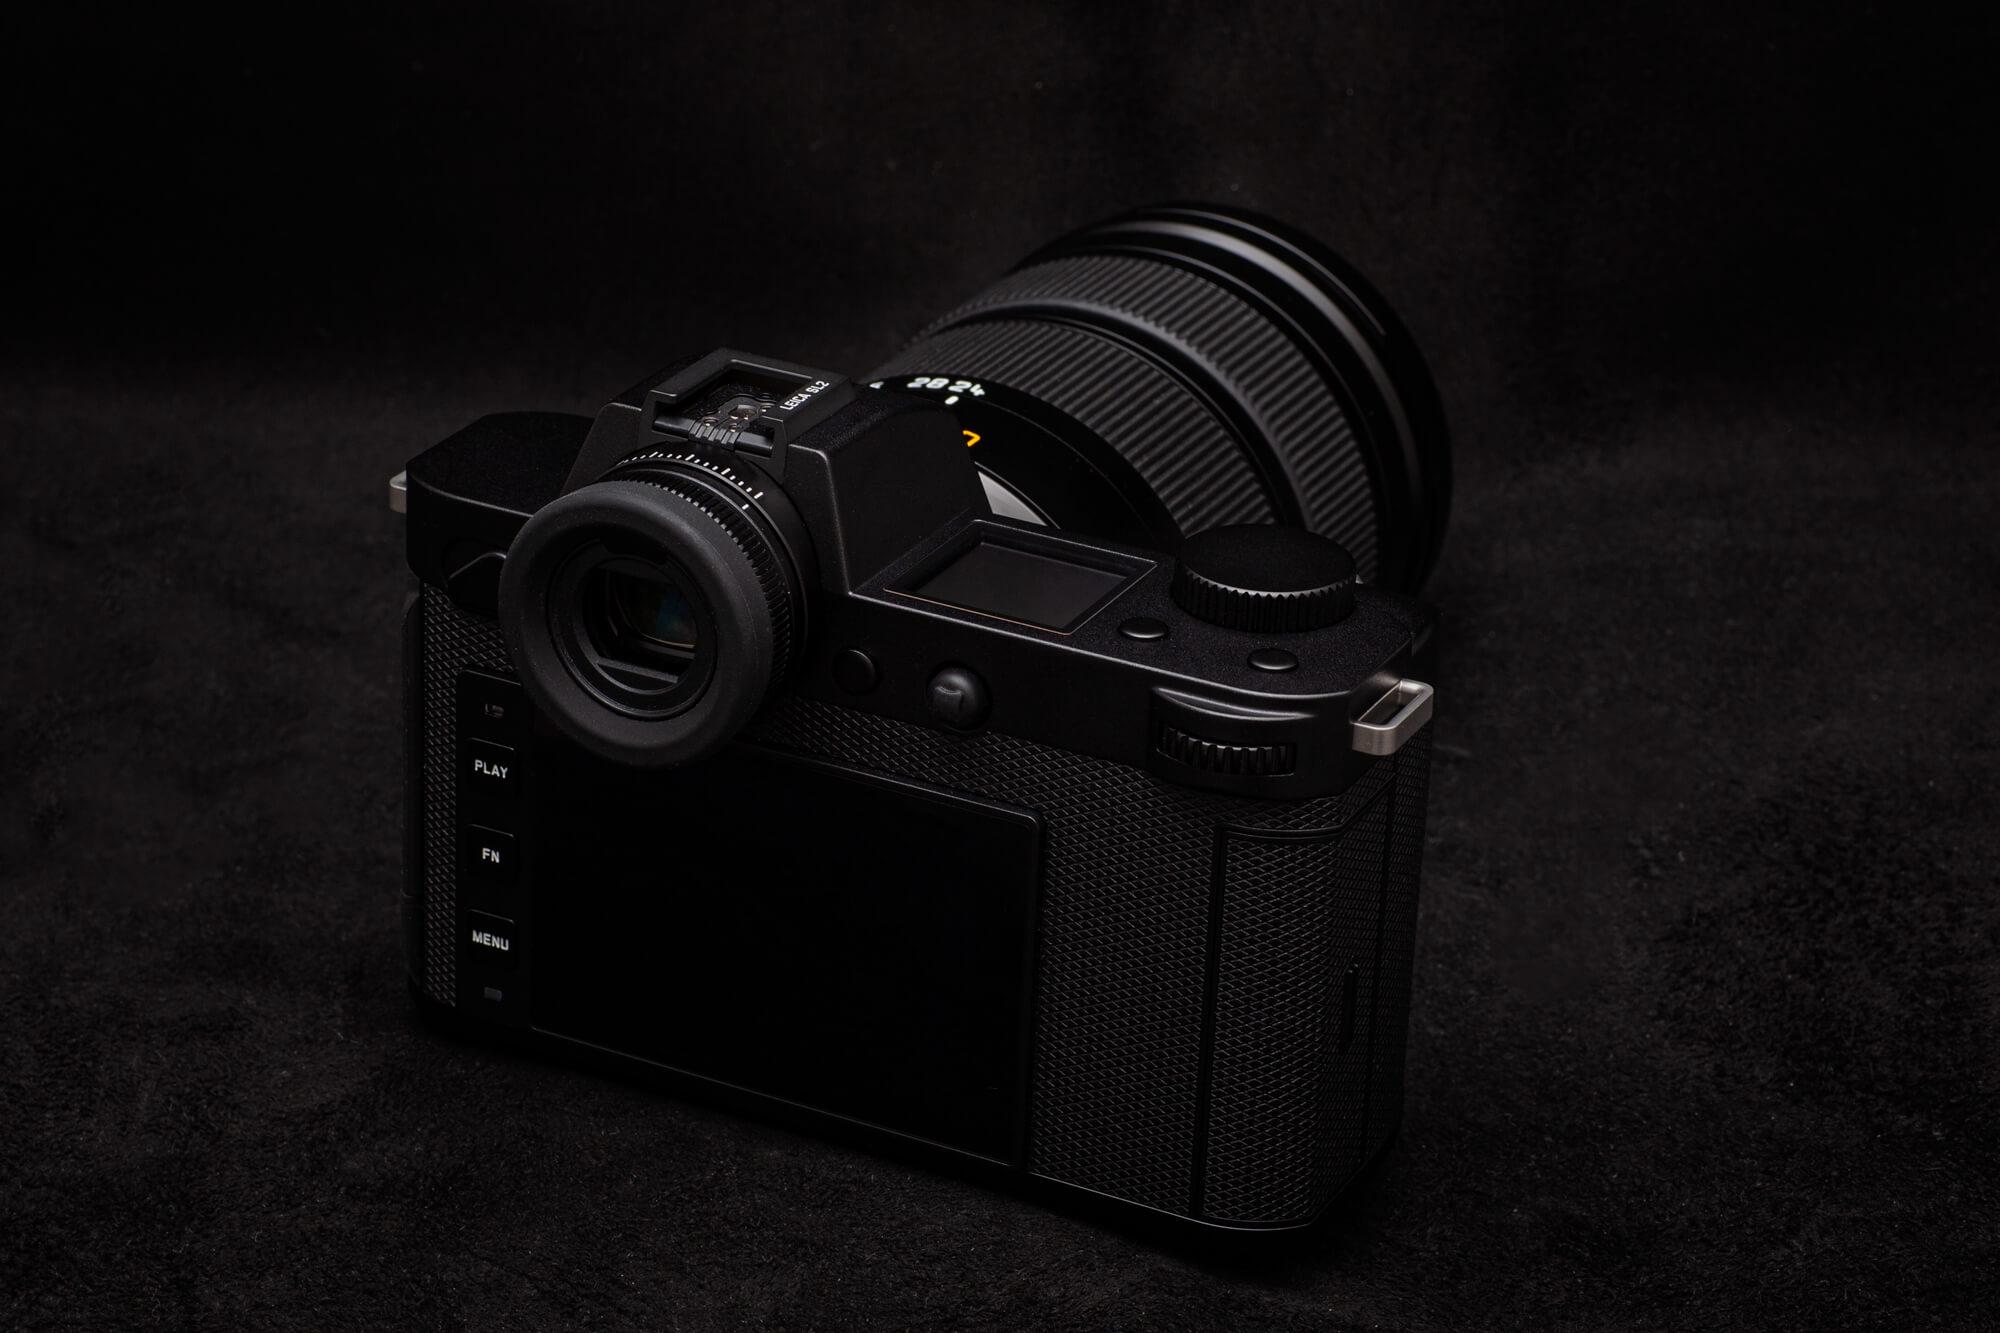 Leica (ライカ) SL2